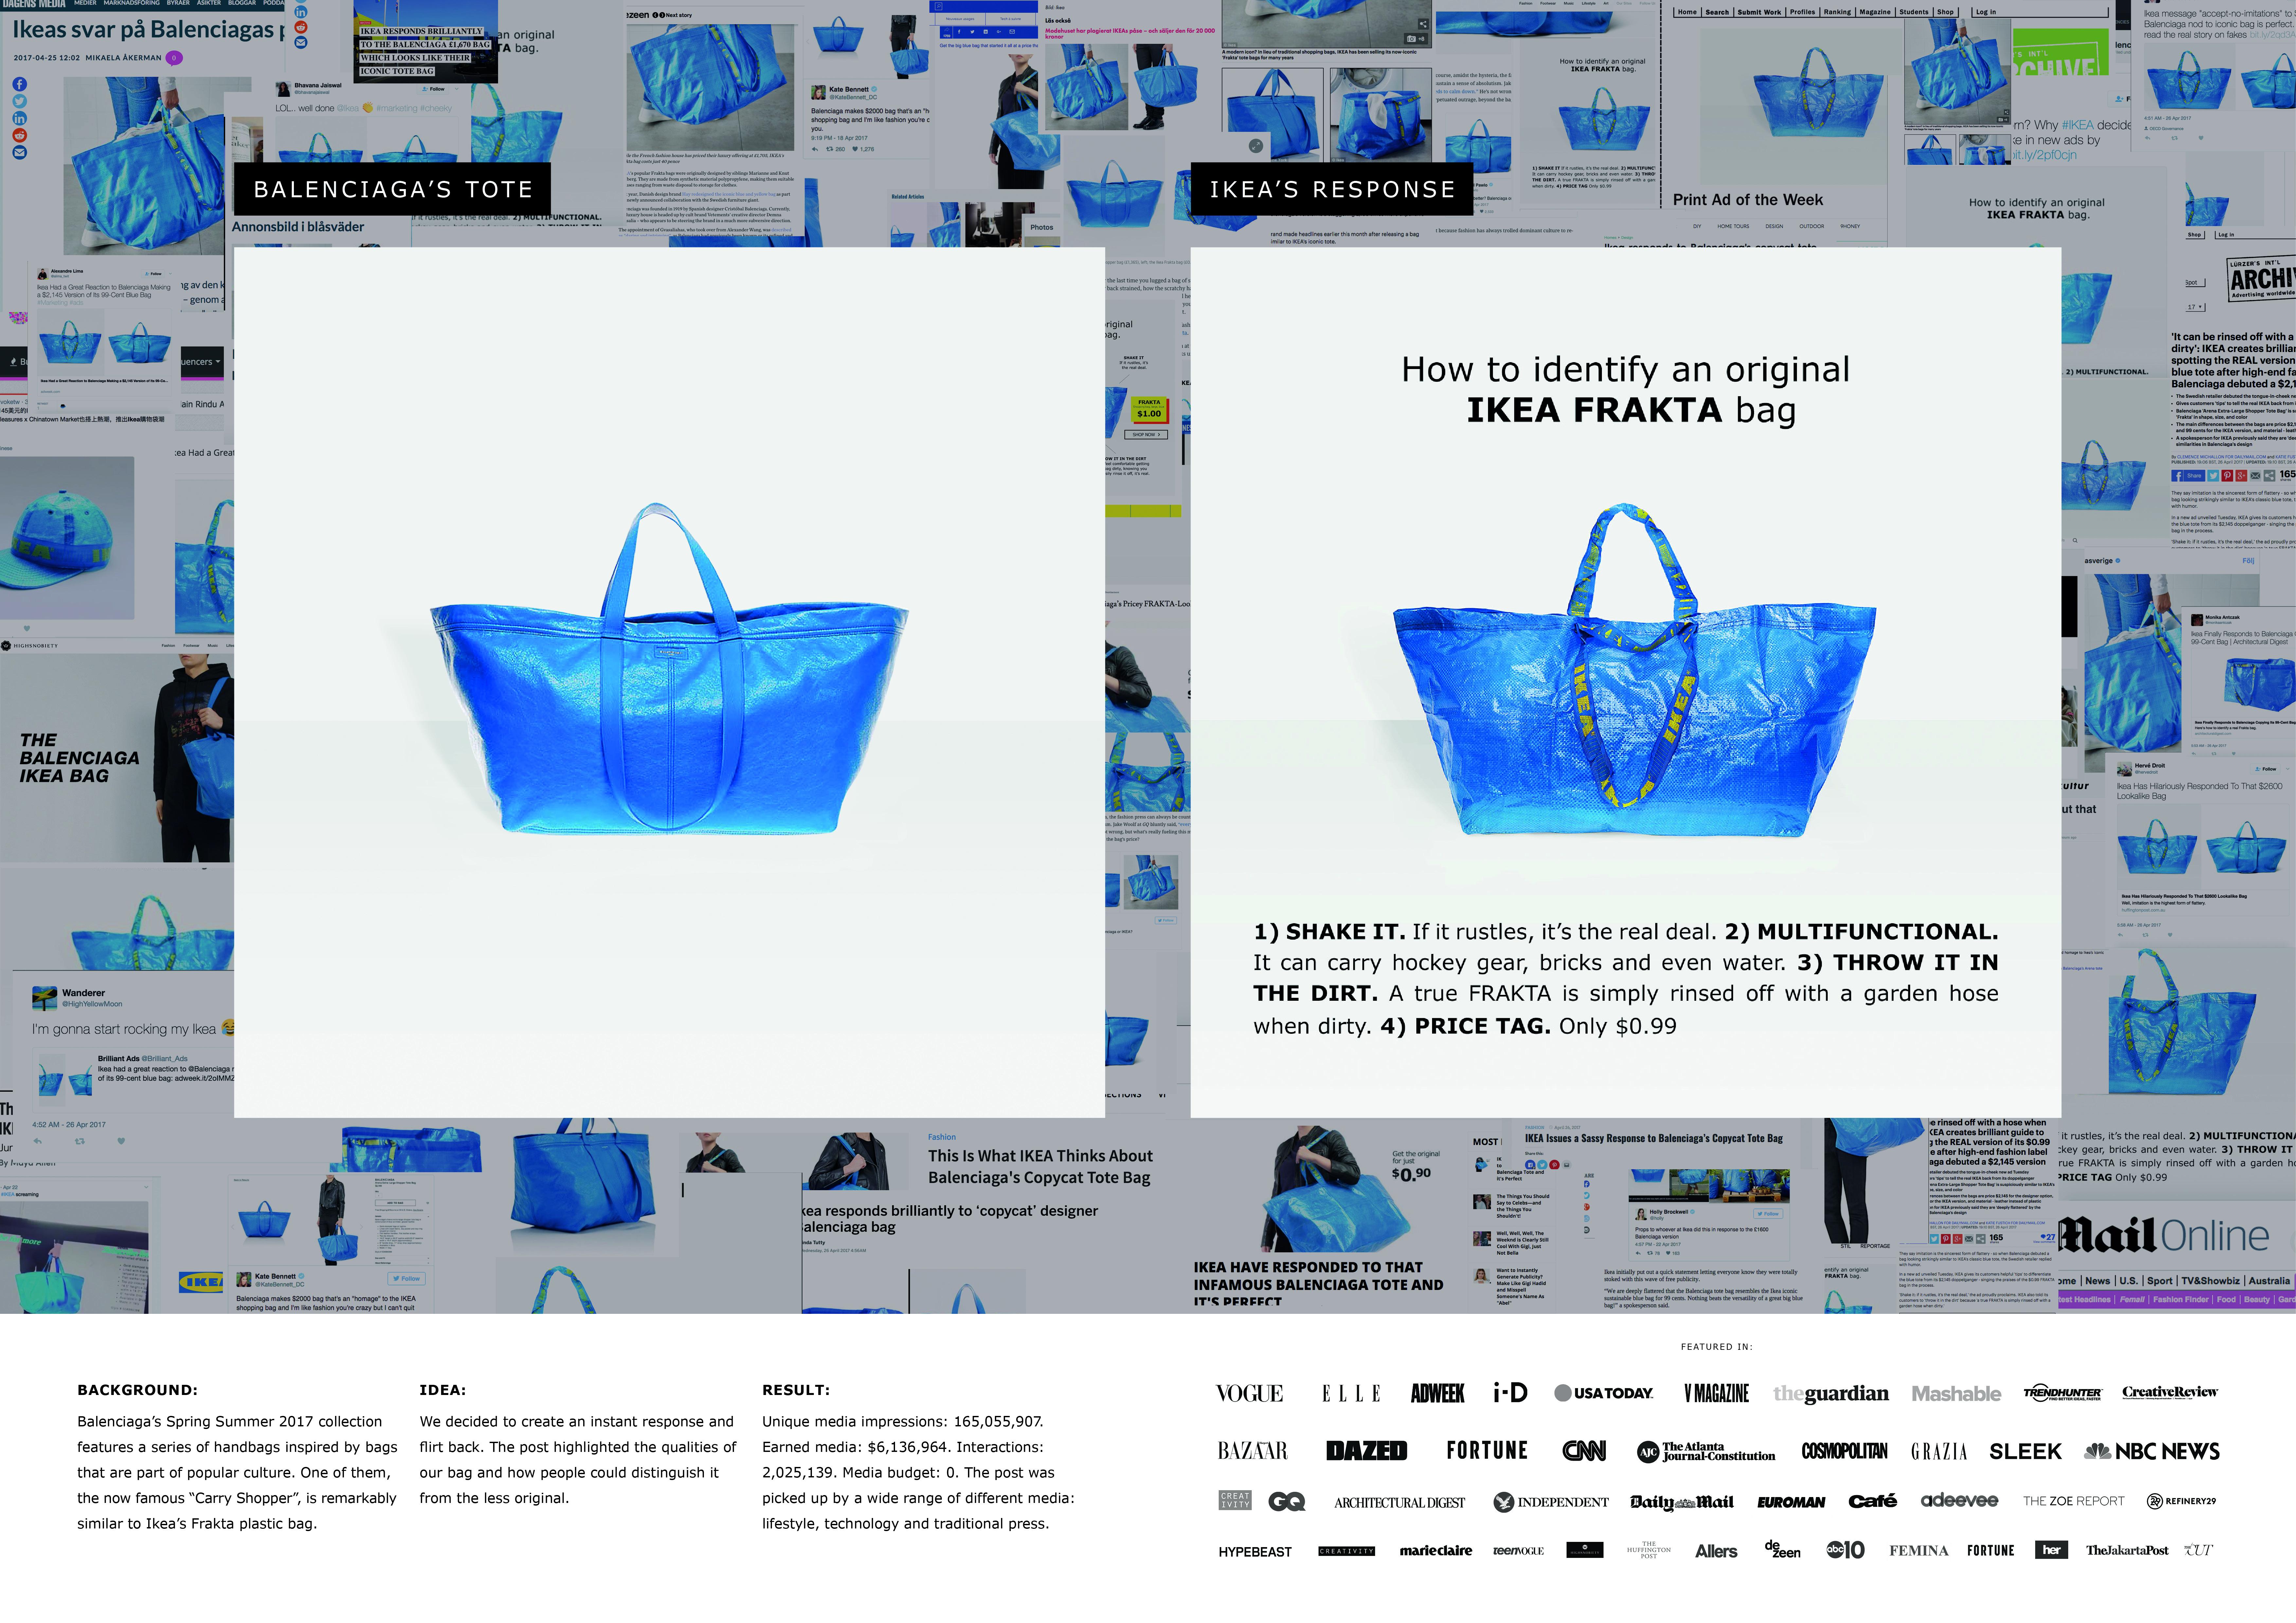 Ikea Responds to Balenciaga Thumbnail